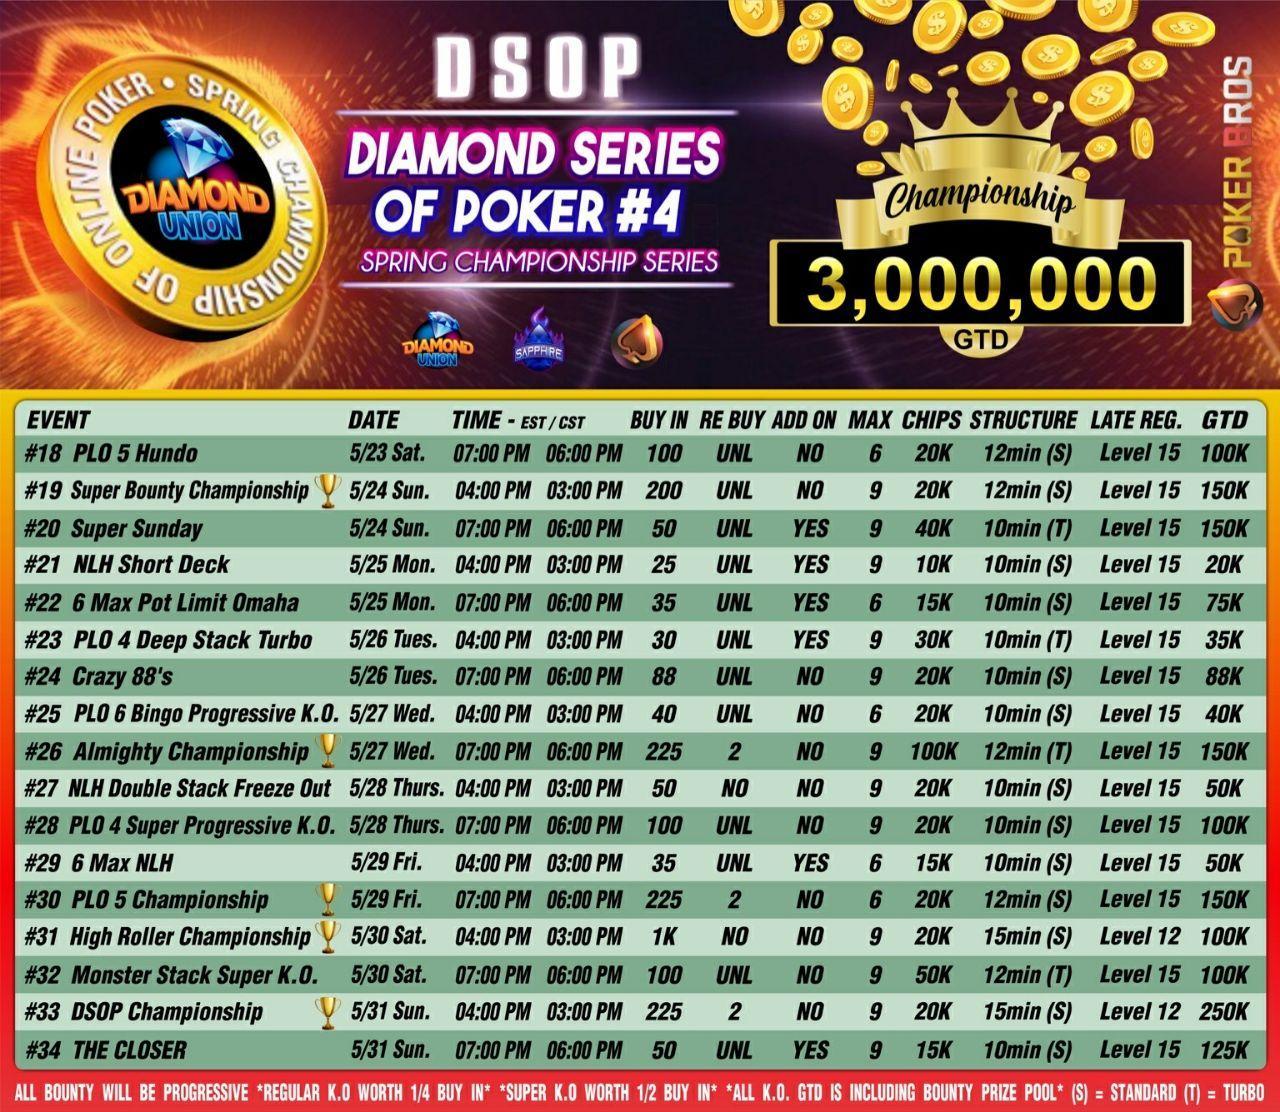 http://hr.pokerpro.cc/uploads/hr.pokerpro.cc/2020/5/popisturnira.jpg